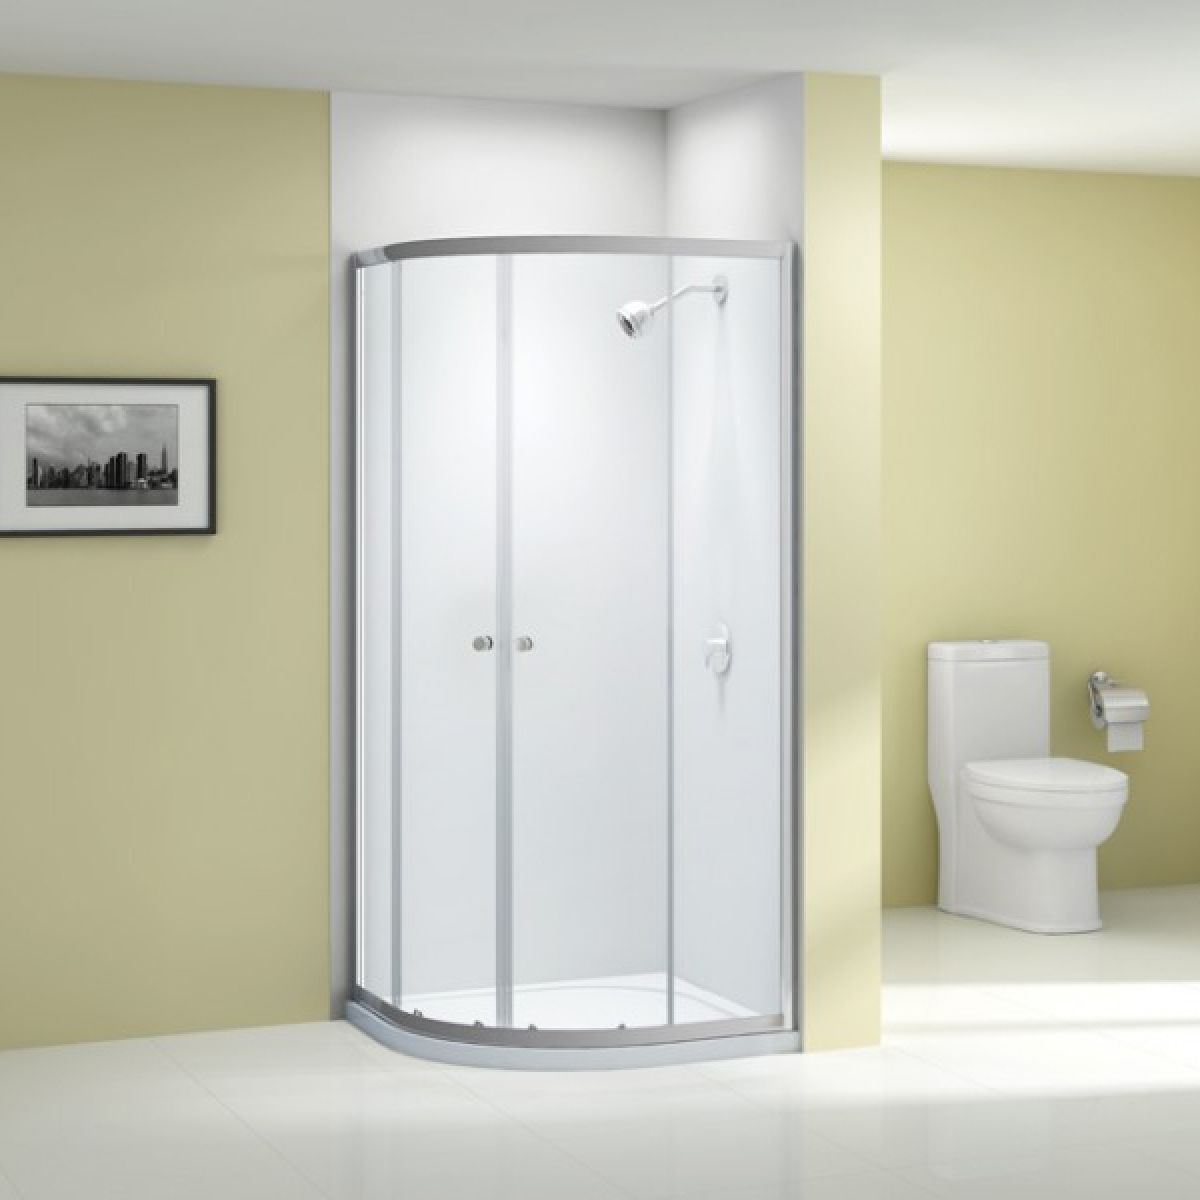 Merlyn Ionic Source Double Door Quadrant Shower Enclosure